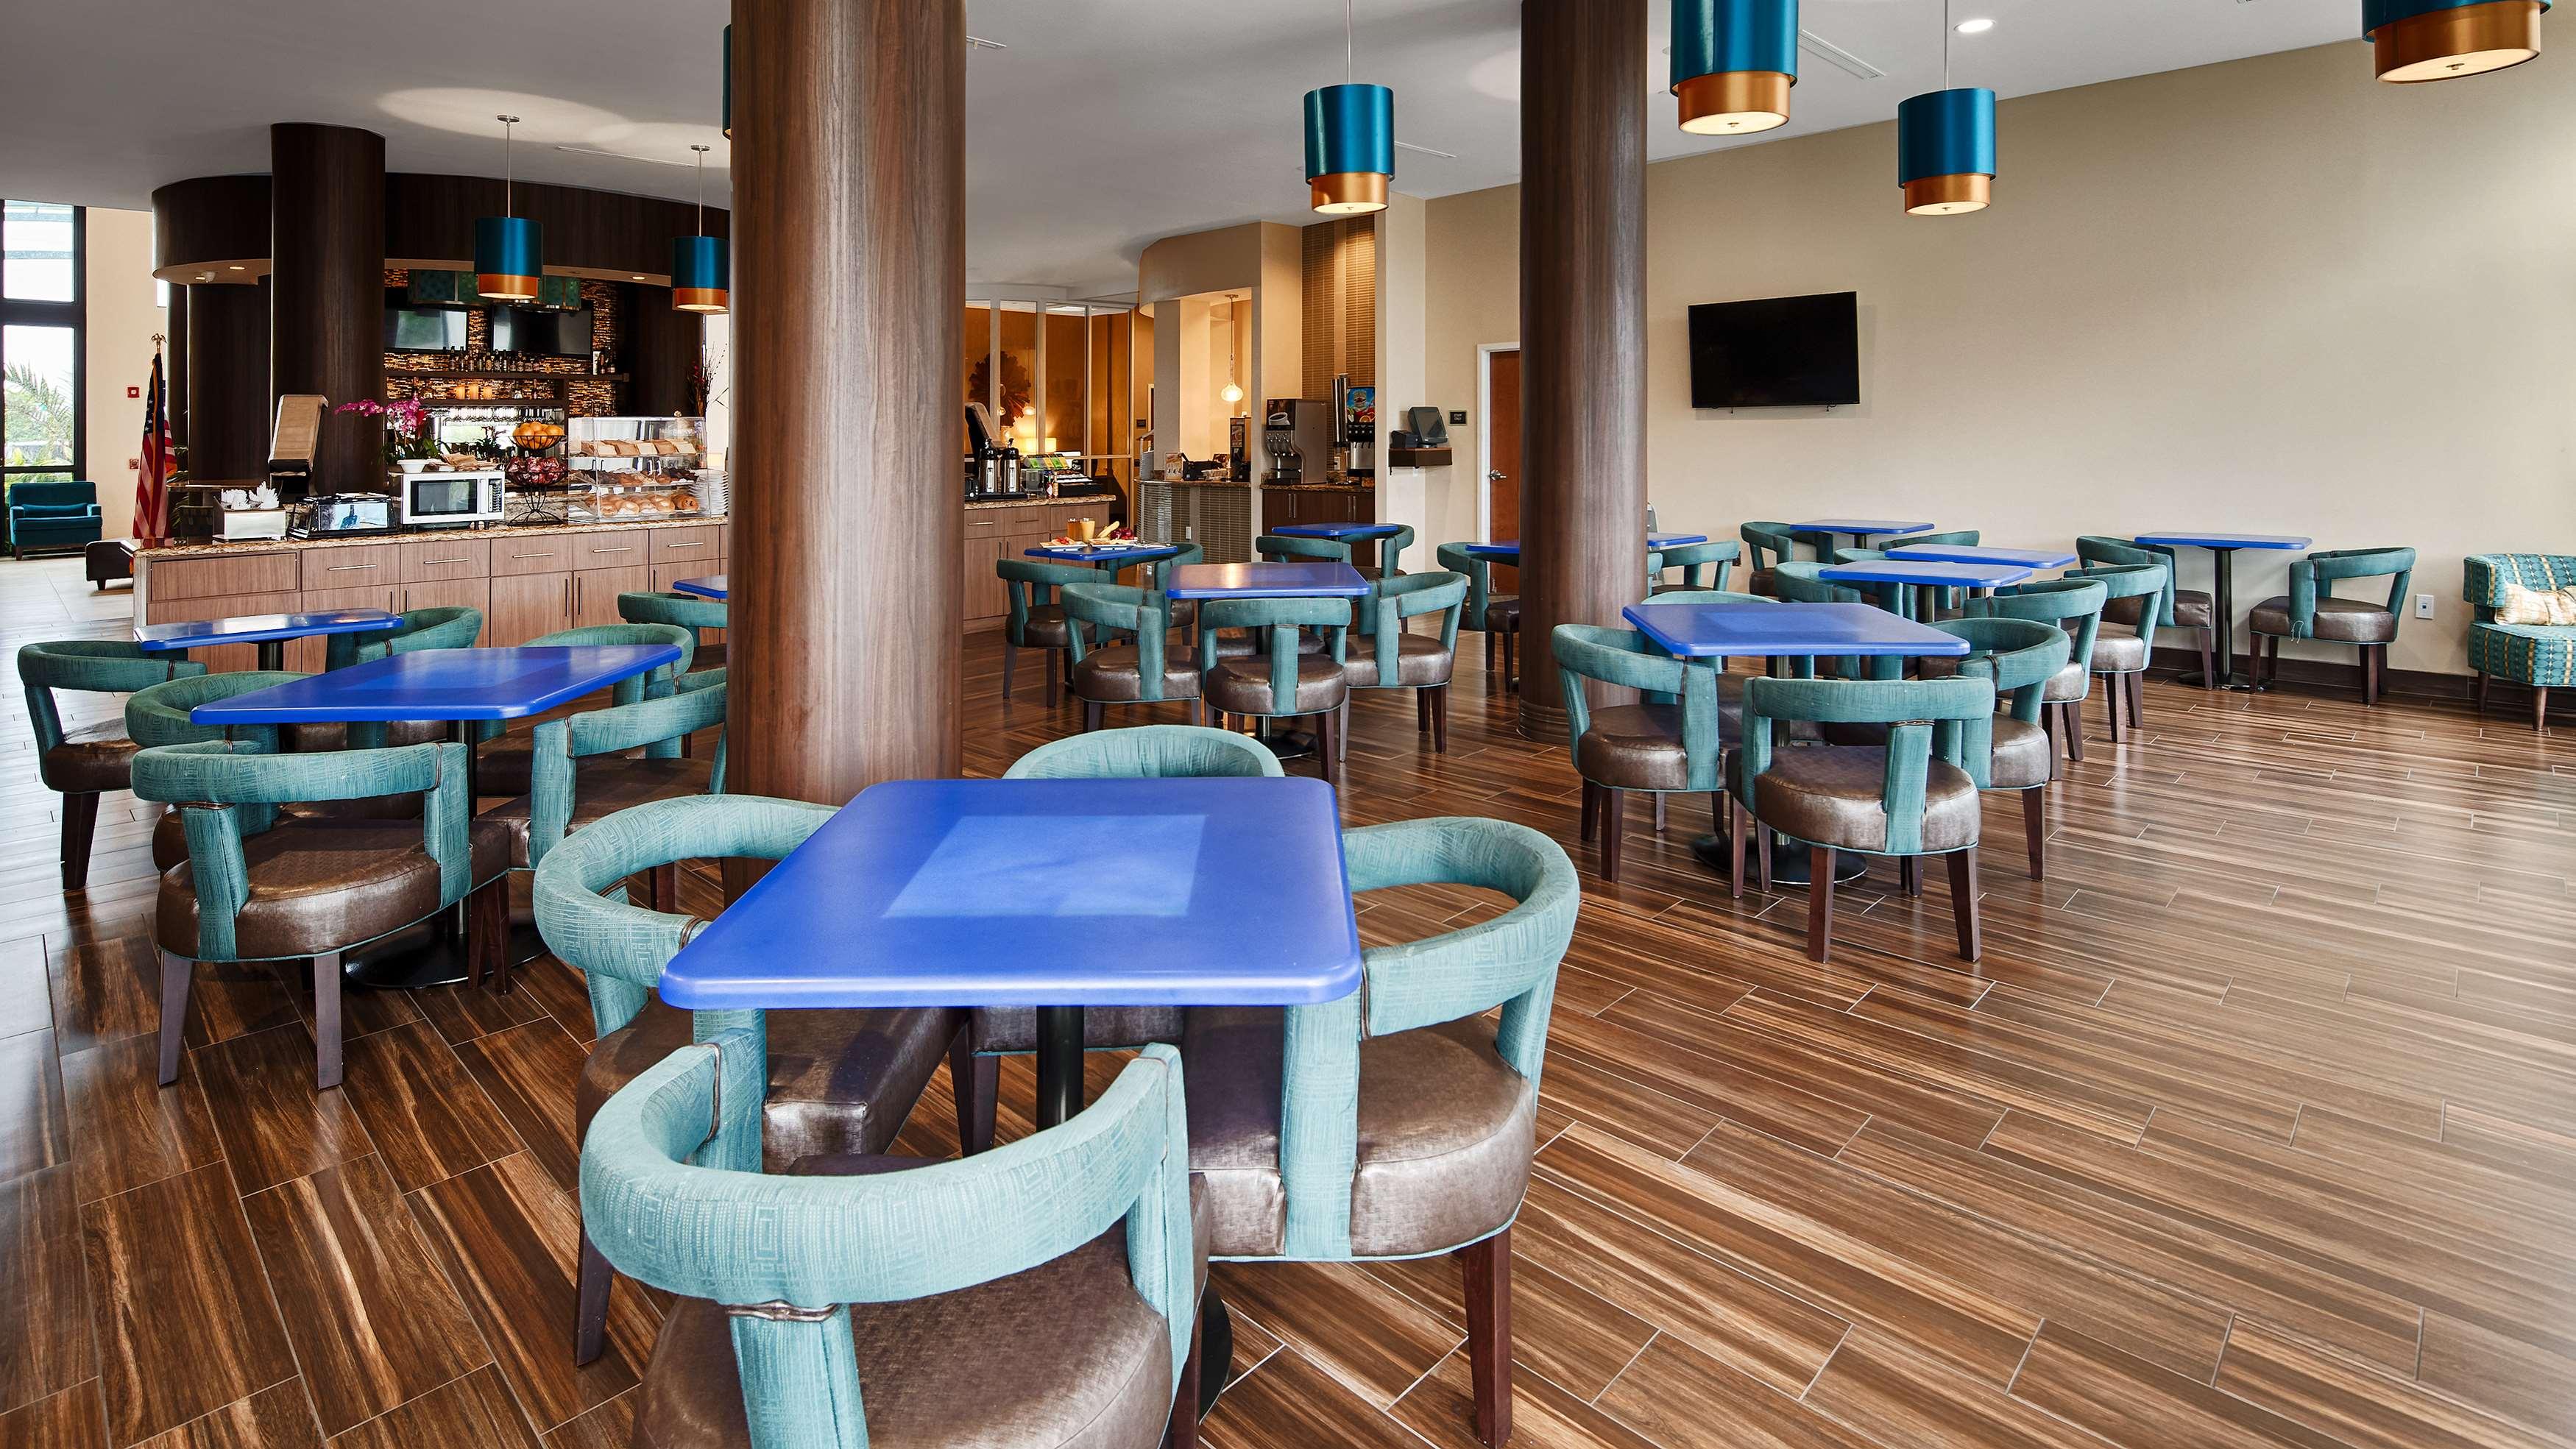 Best Western Plus Kendall Airport Hotel & Suites image 32